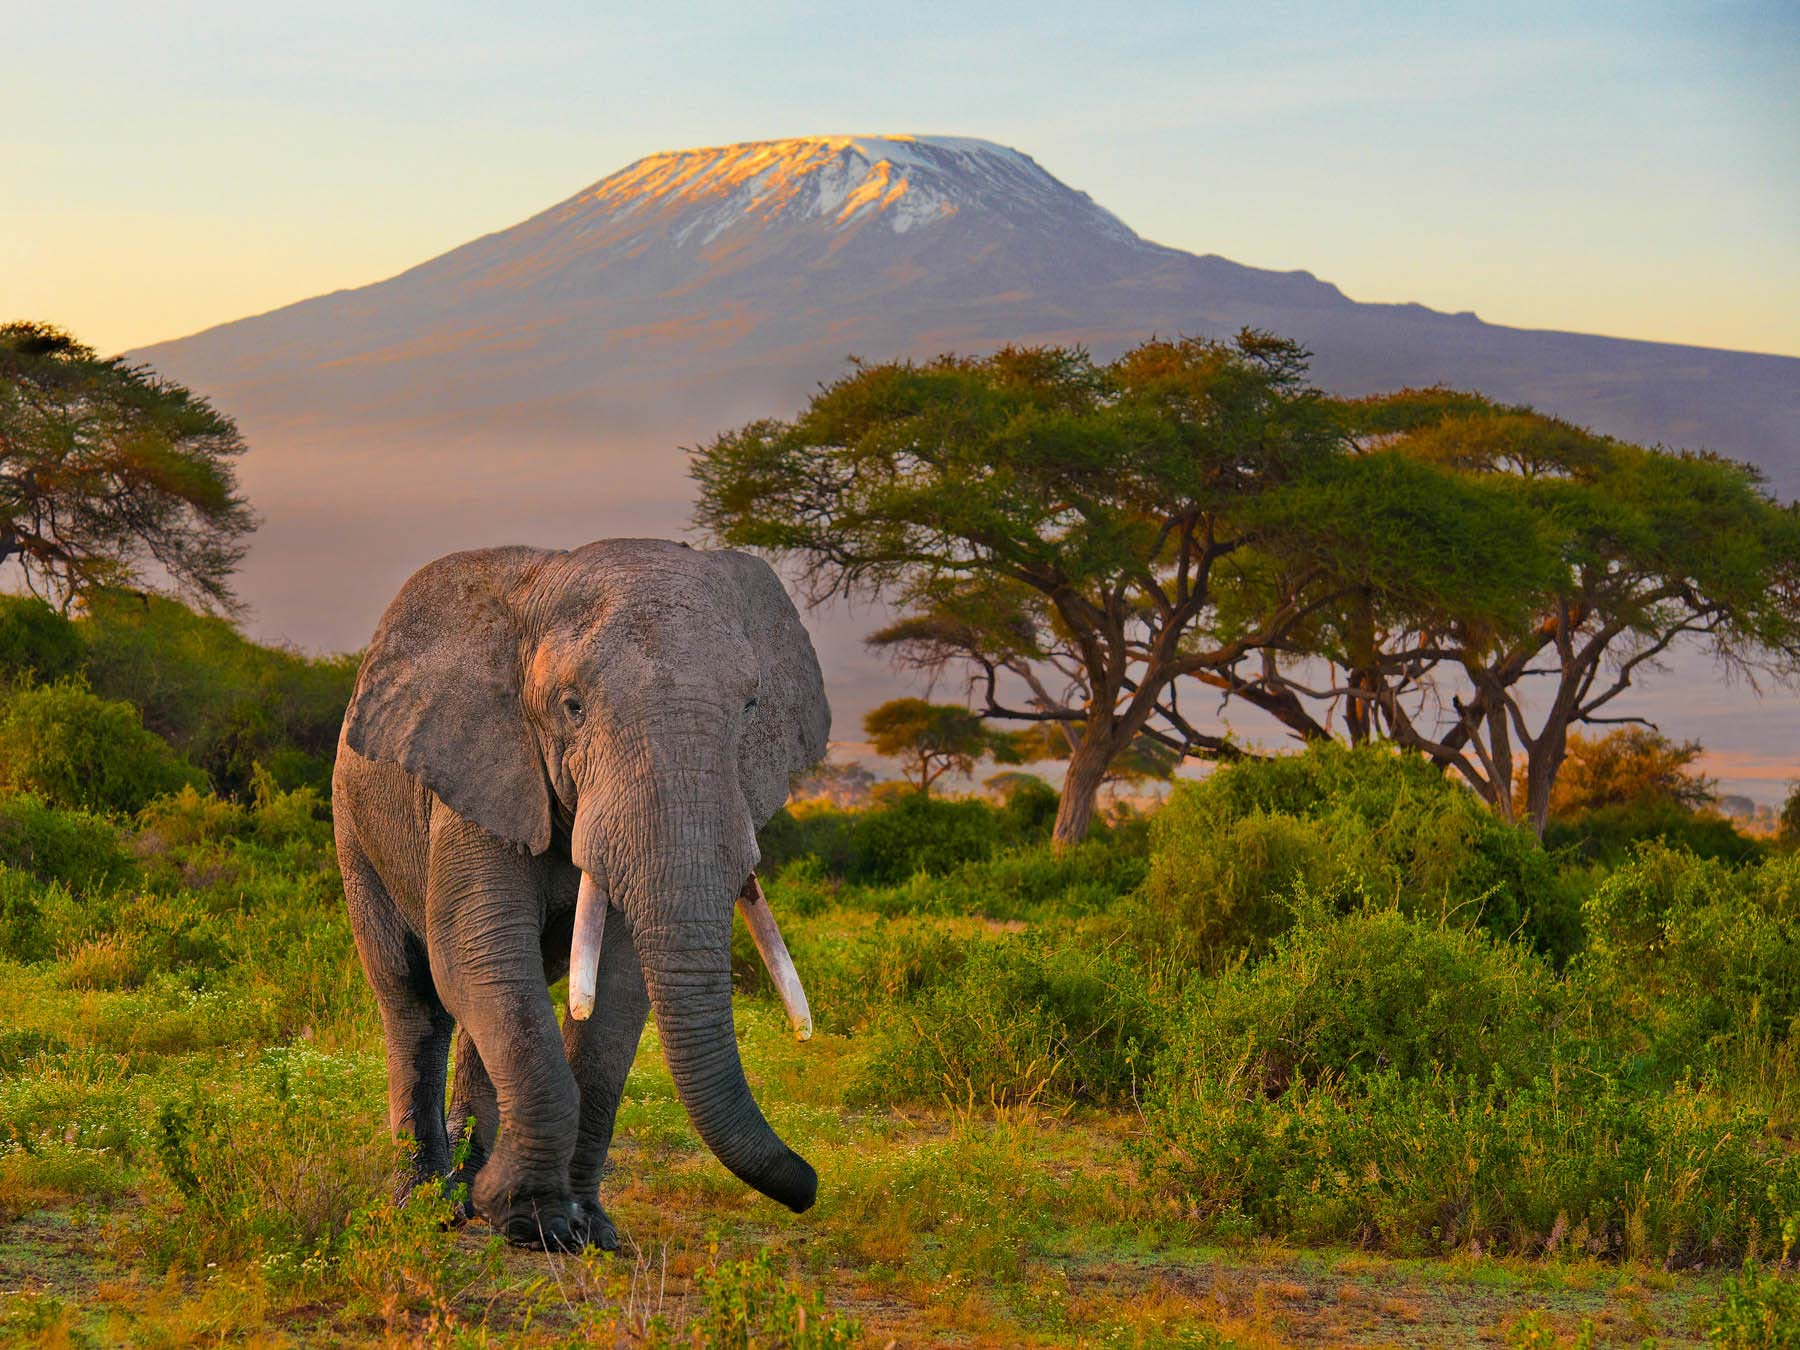 Bull elephant in front of Mount Kilimanjaro, Kenya.